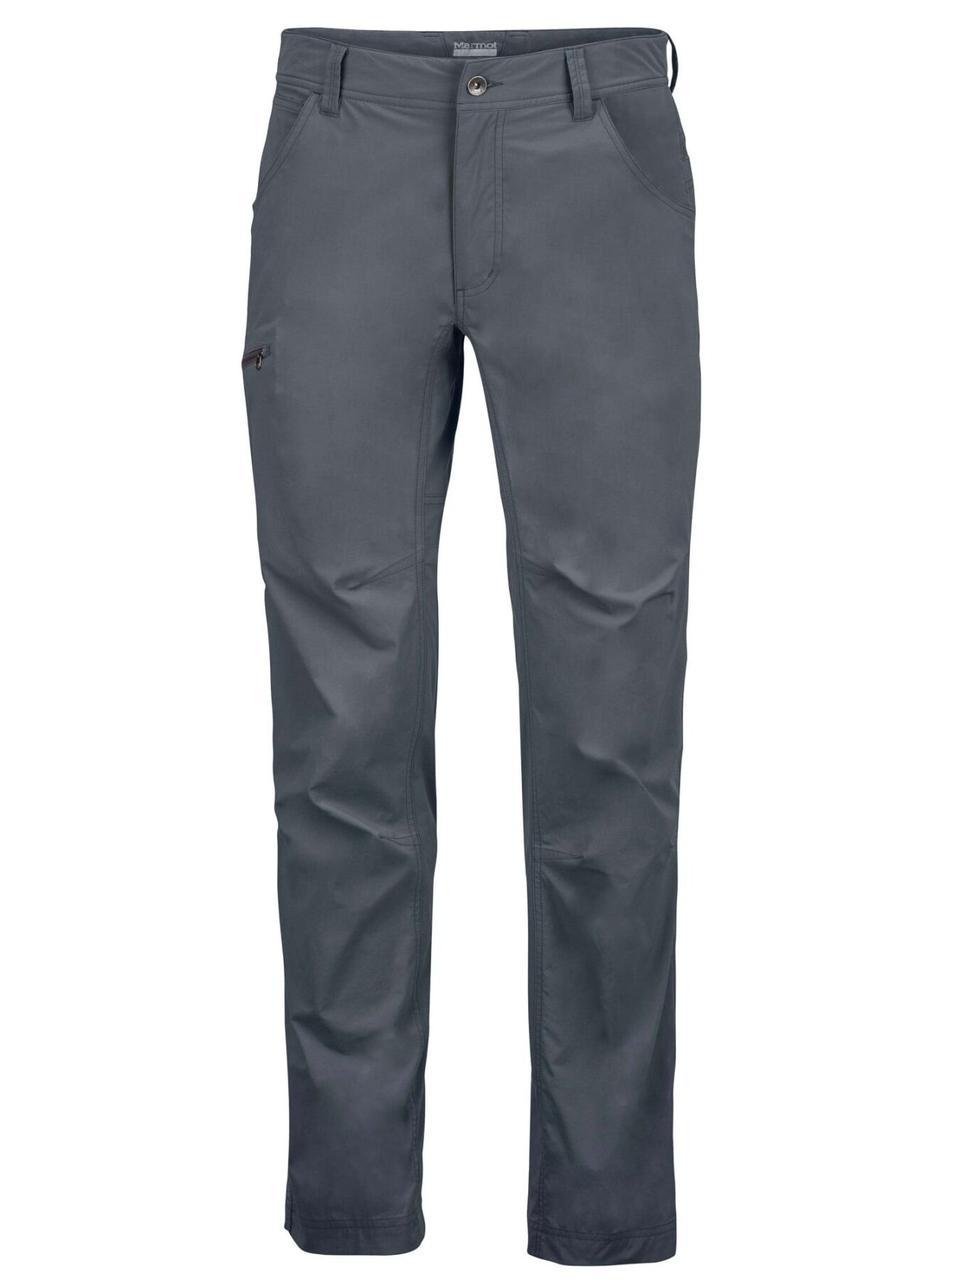 Штаны мужские Marmot Men`s Arch Rock Pant Long Slate Grey, р.30